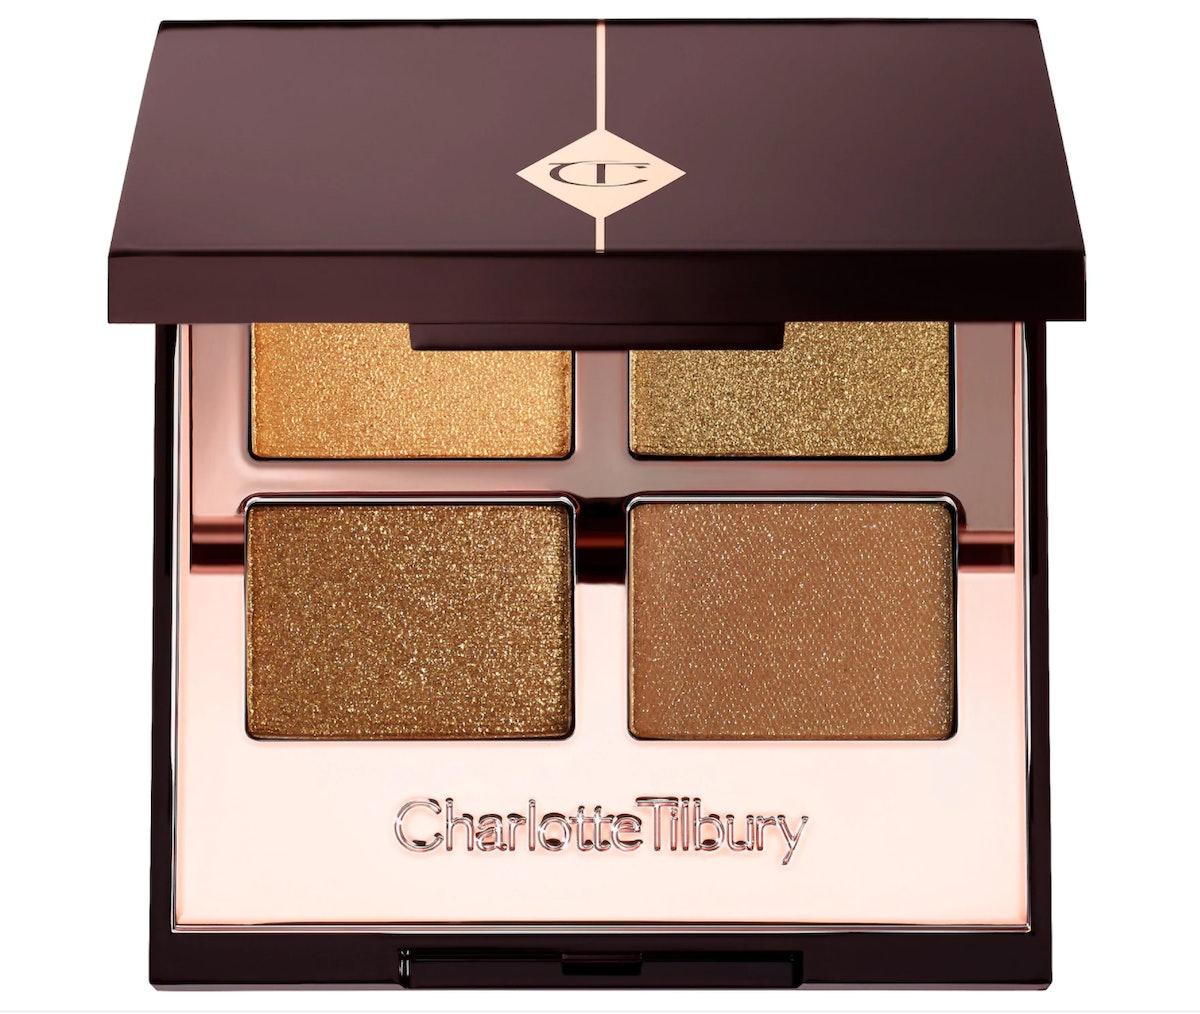 Charlotte Tilbury Luxury Eyeshadow Palette - Eye Color Magic Collection